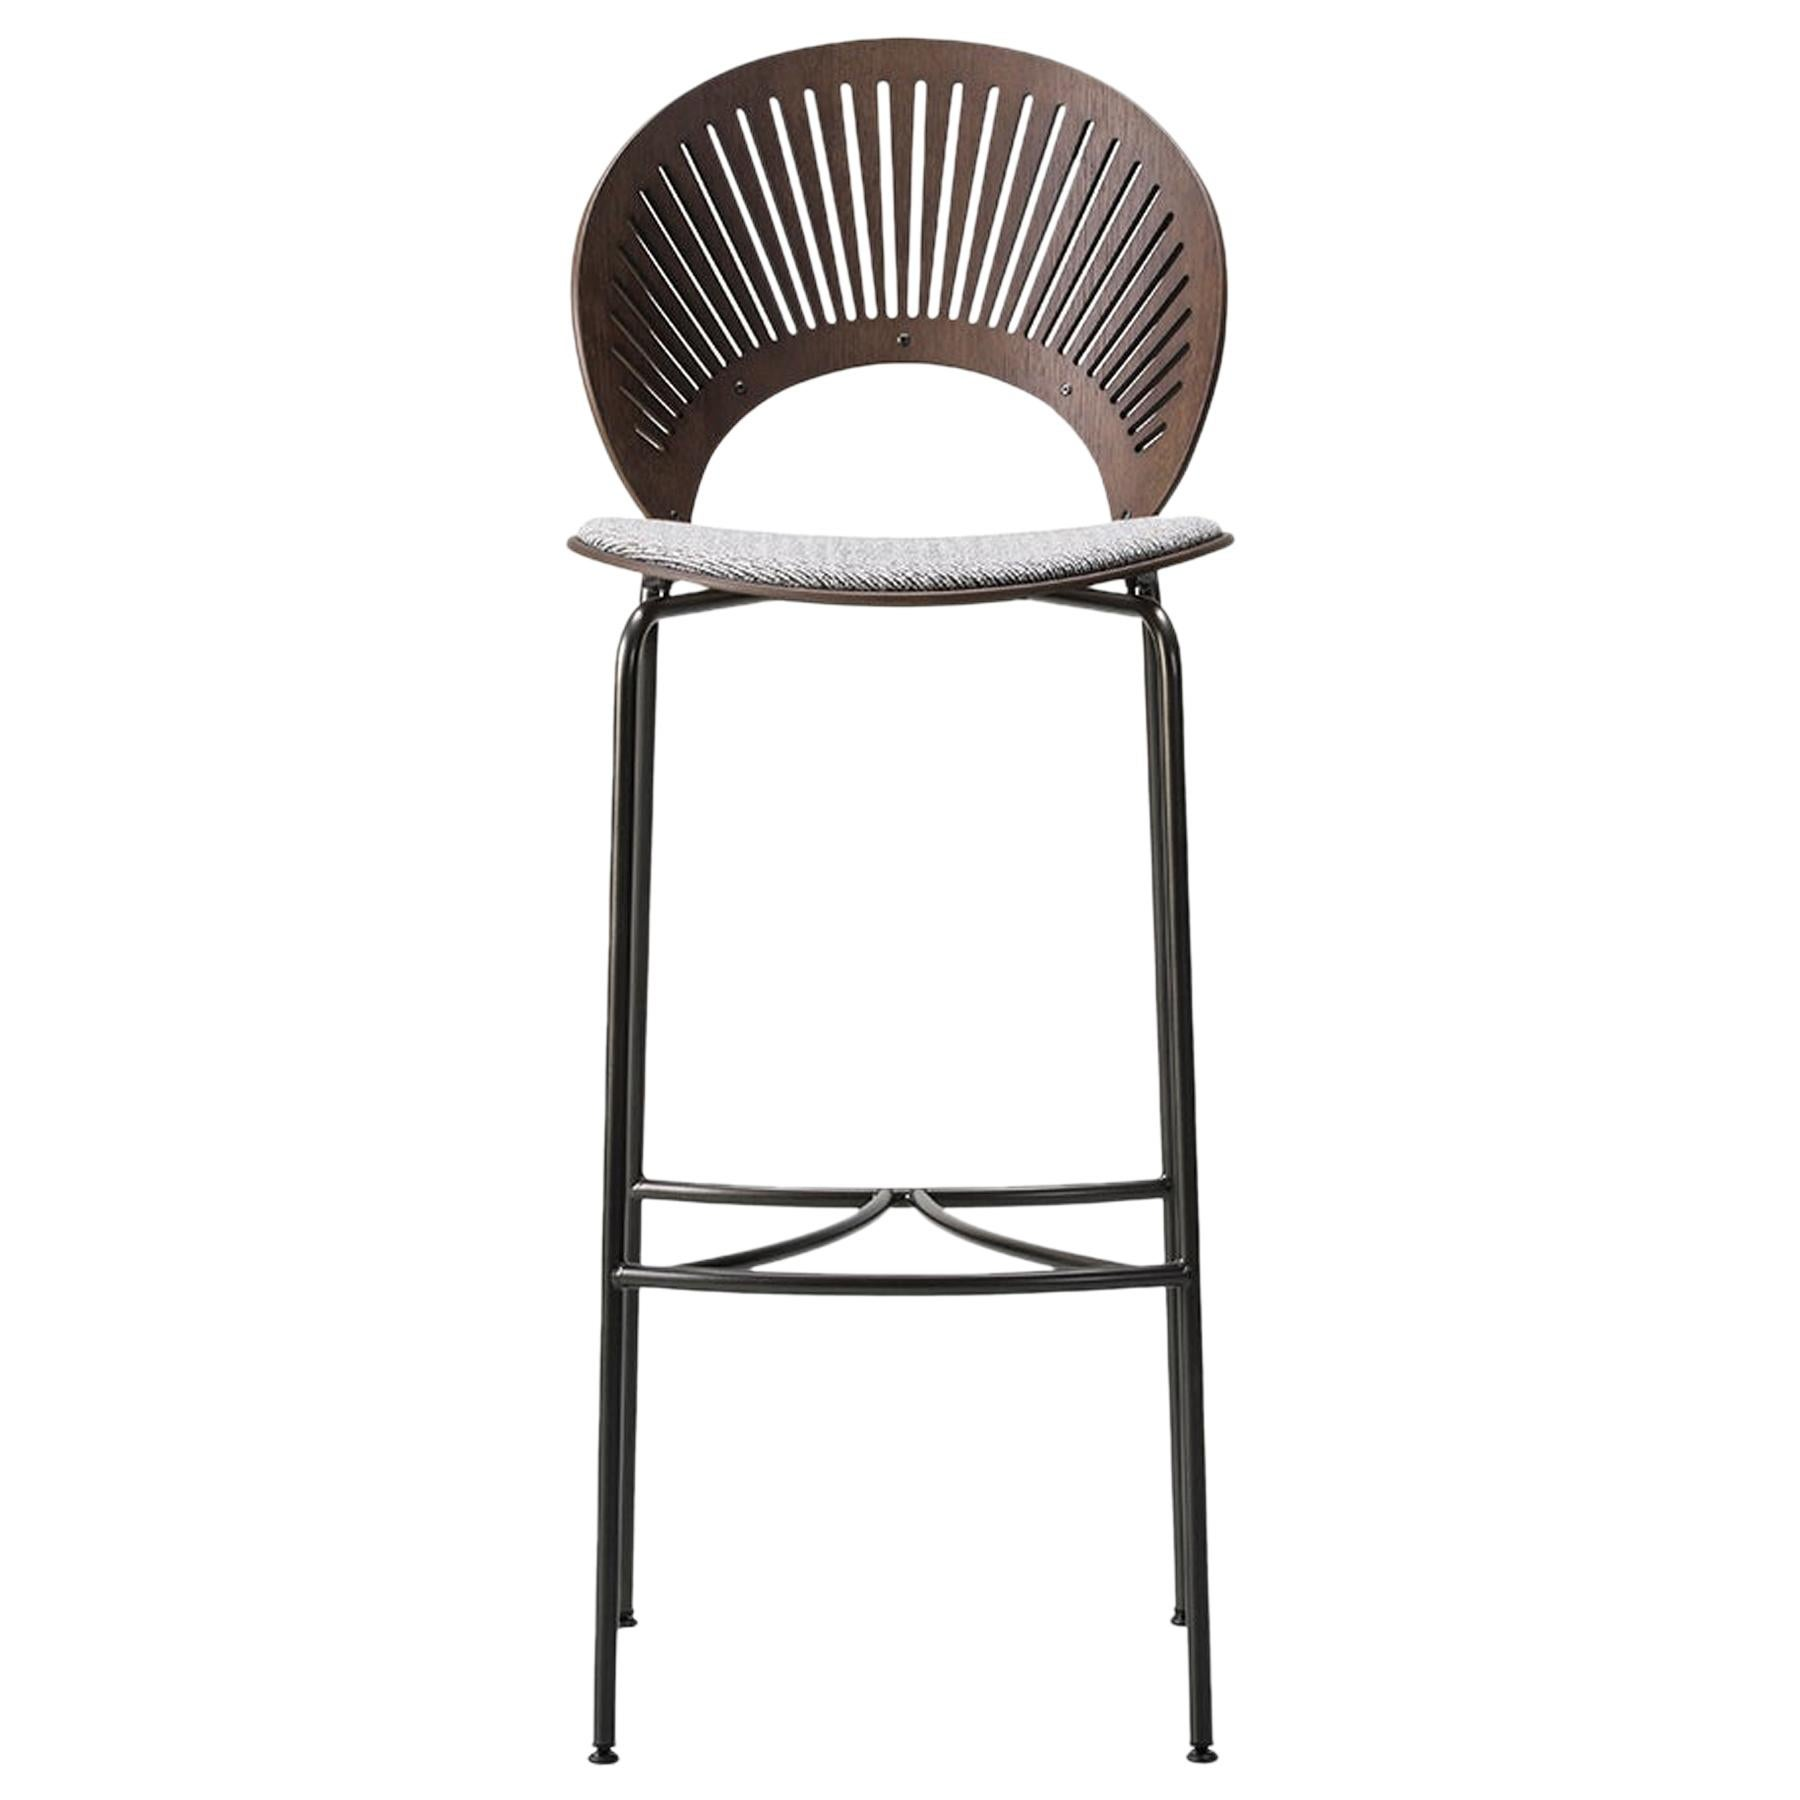 Nanna Ditzel Trinidad Barstool Seat Upholstered